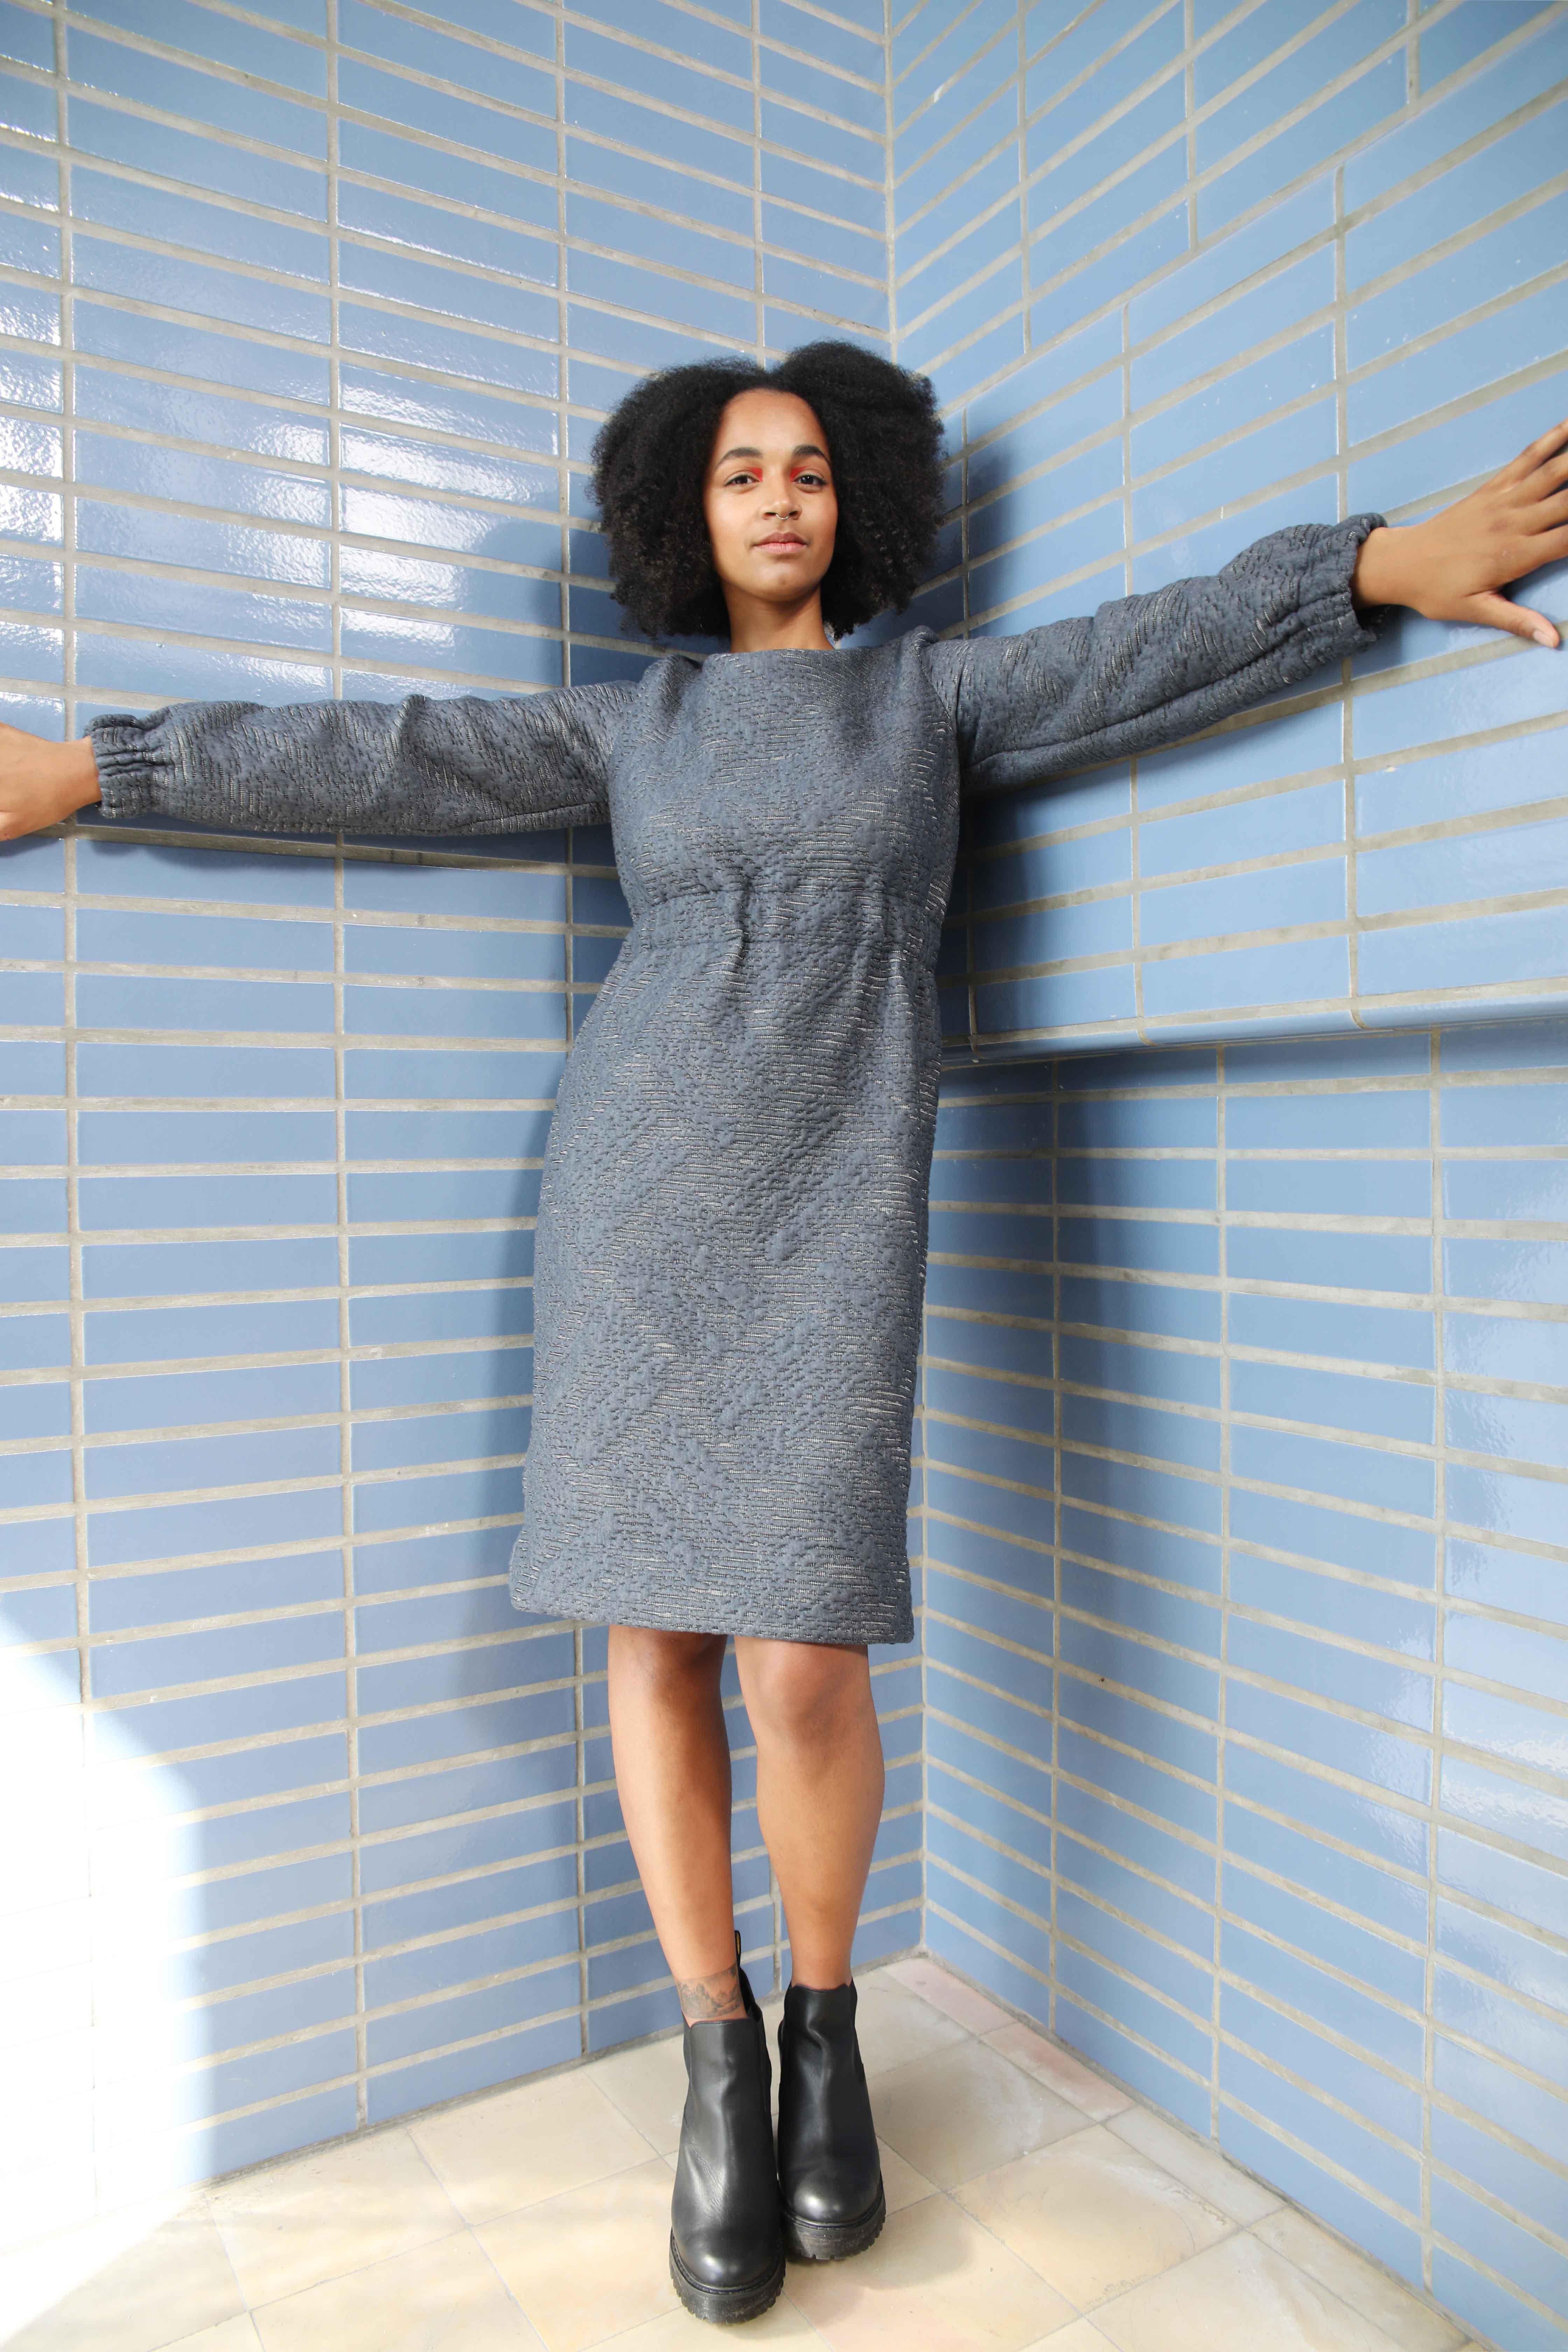 slow fashion, outfit, kleren, sustainable, transparant, social, ecologisch, dress, vrouwen, elastiek, blauw, grijs